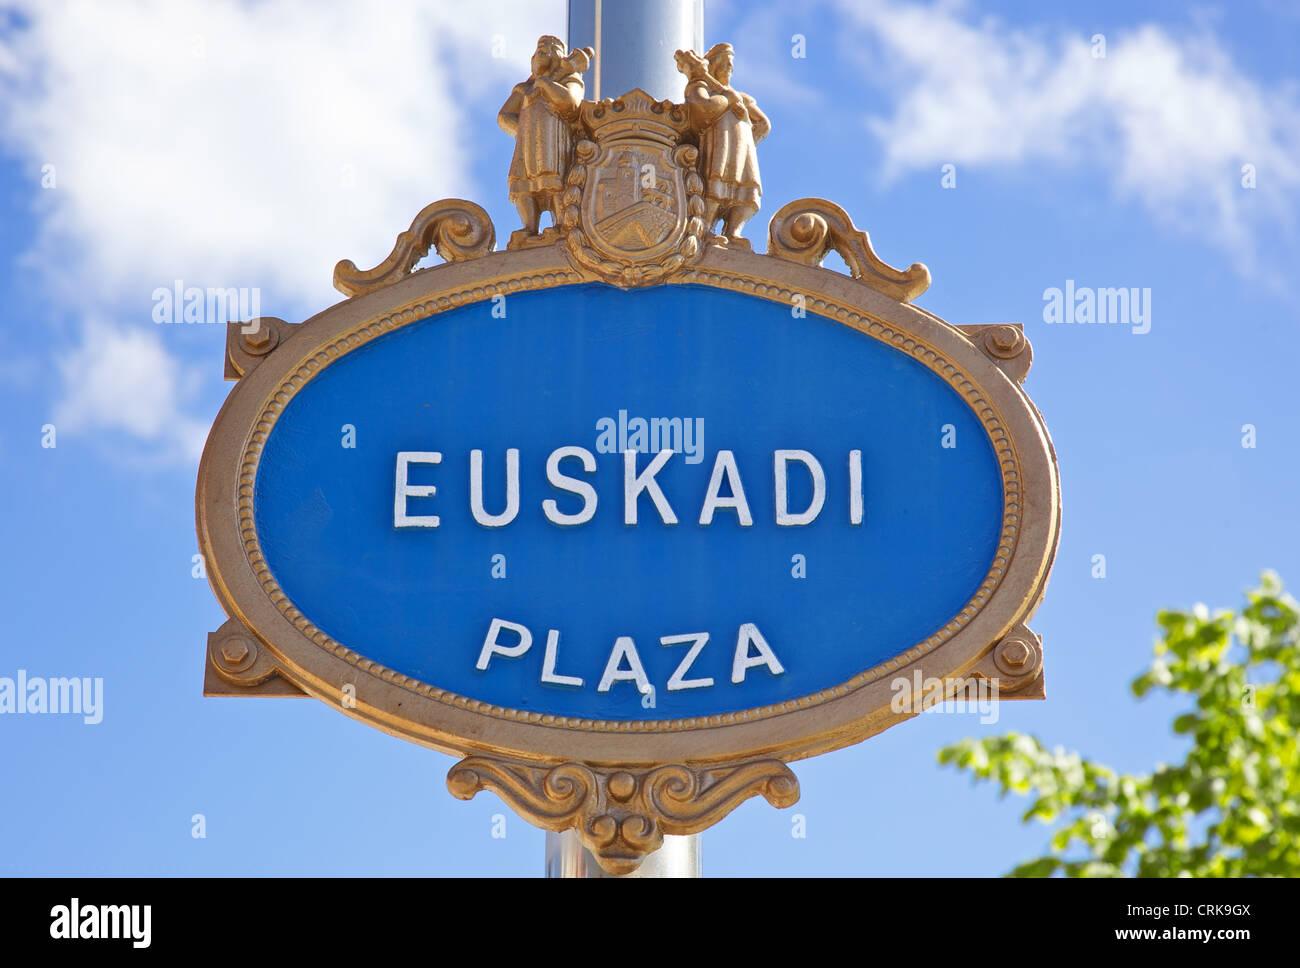 Euskadi Plaza plate at Bilbao - Stock Image